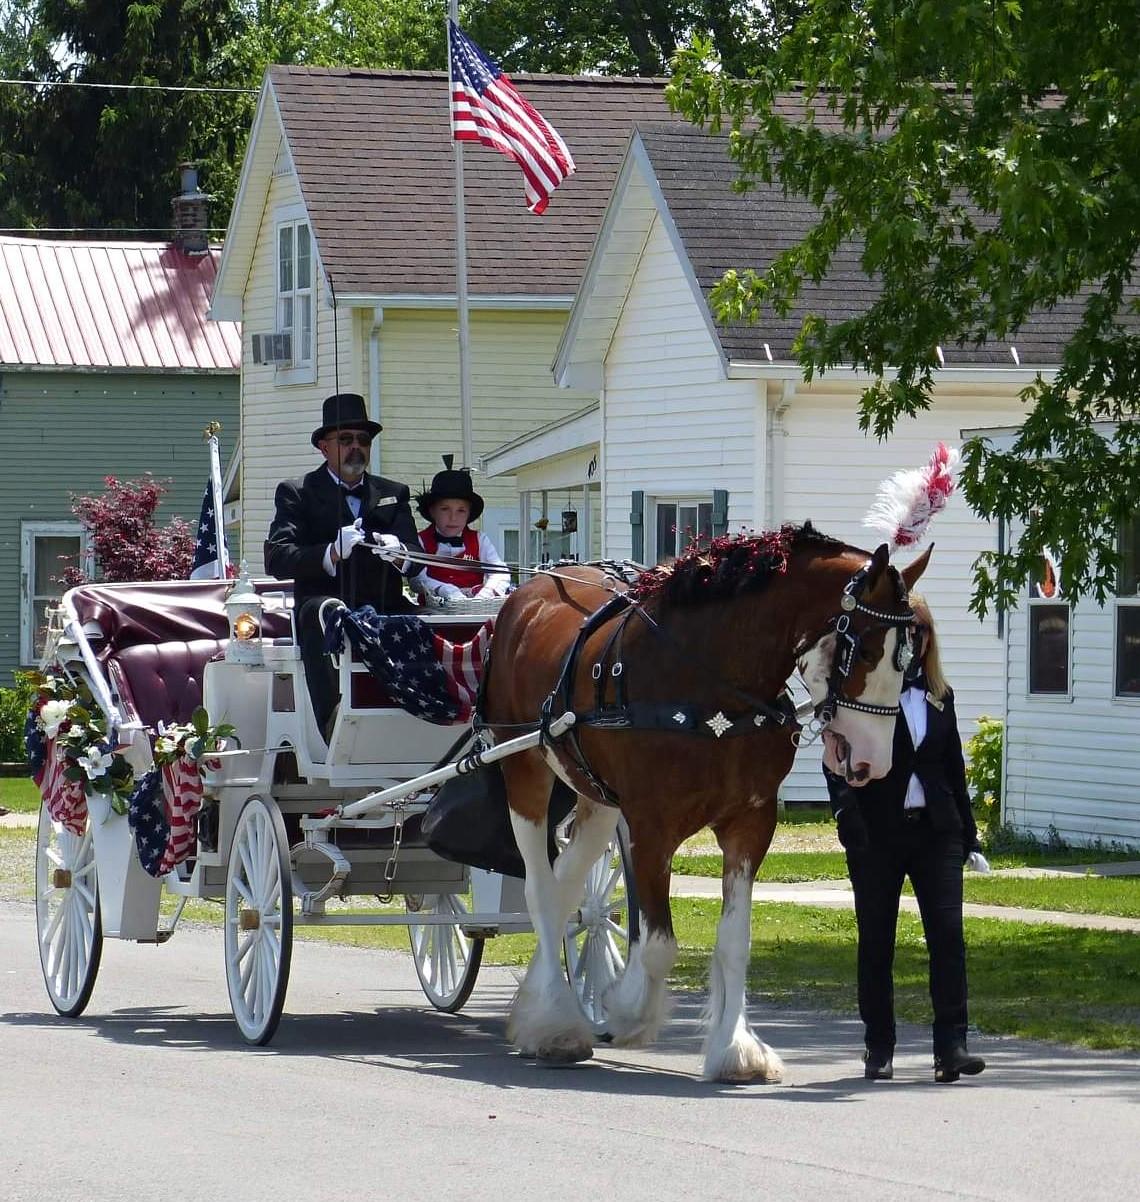 Memorial Day parade, Alger Ohio